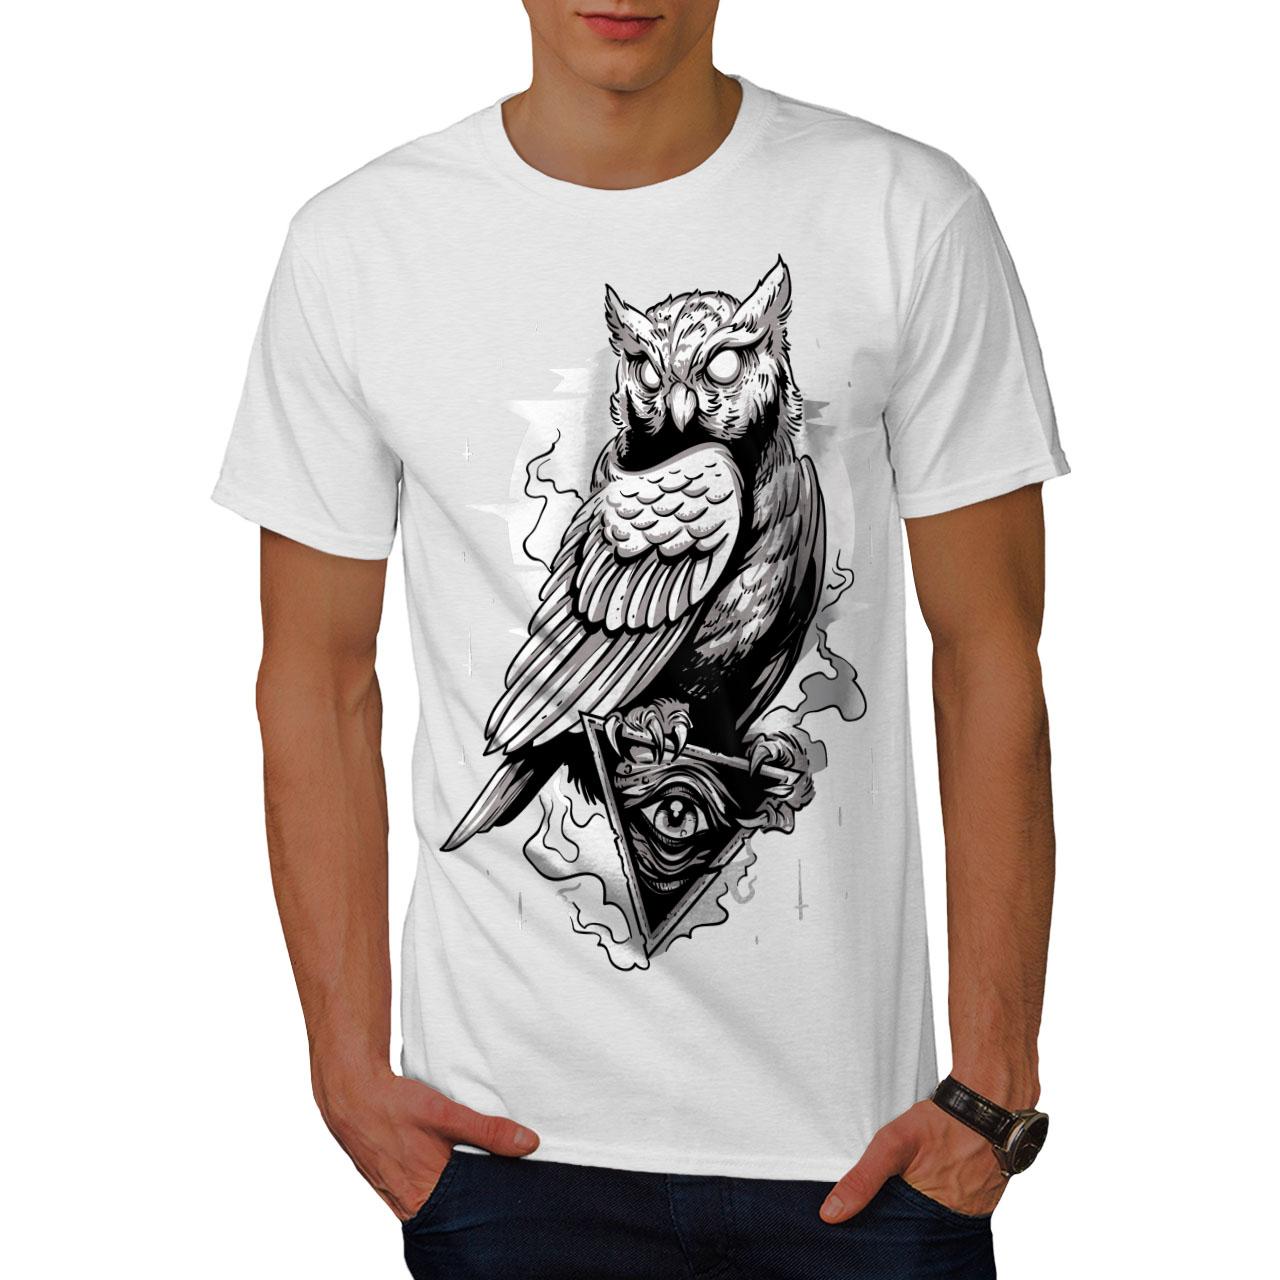 miniature 9 - Wellcoda Triangle Owl Mens T-shirt, Conspiracy Graphic Design Printed Tee